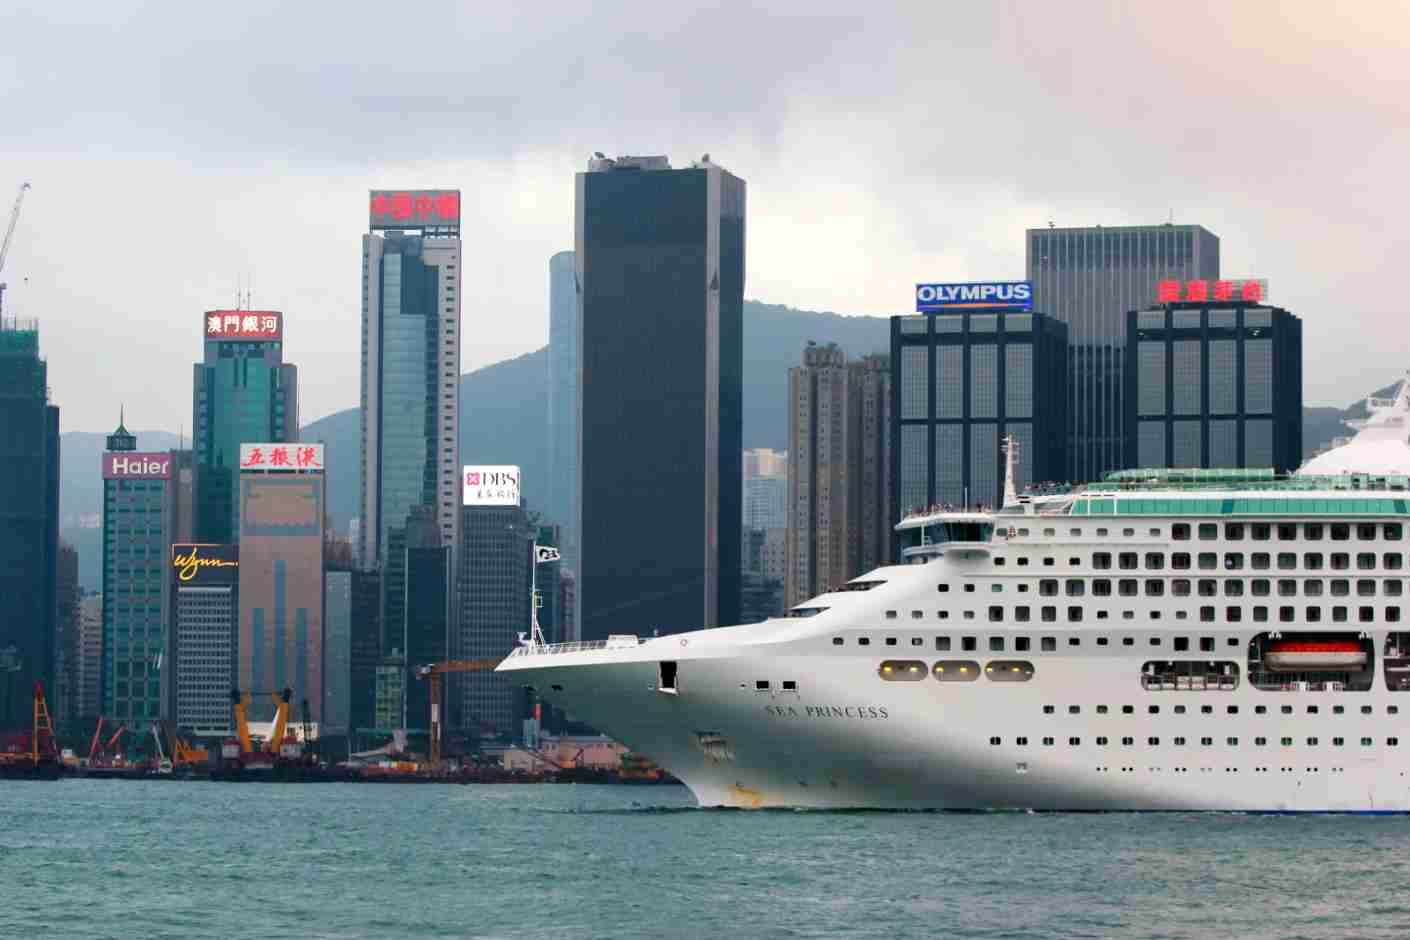 The Sea Princess of Princess Cruises entering Victoria Harbour, Hong Kong. (Photo via Getty Images)